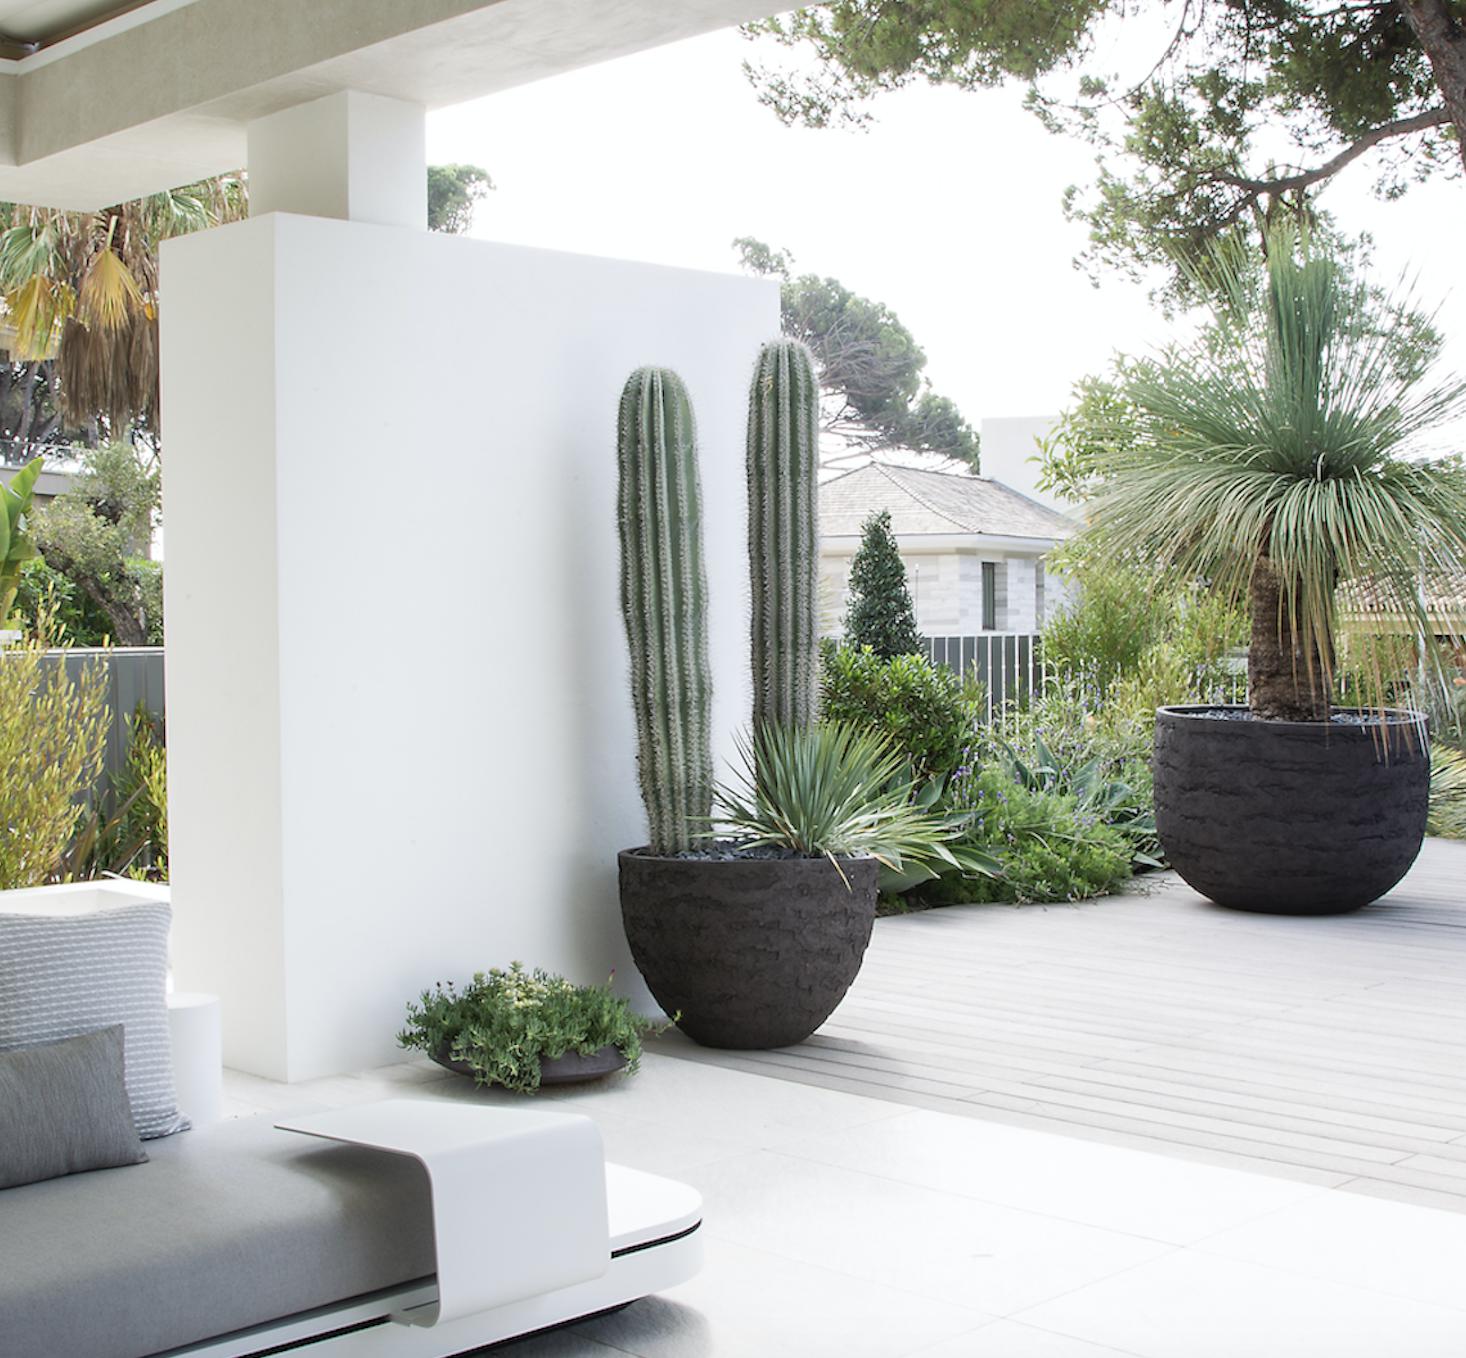 SGD-Garden-Desgn-Trends-2020-Belgian-Design-Garden-by-Mia-Witham